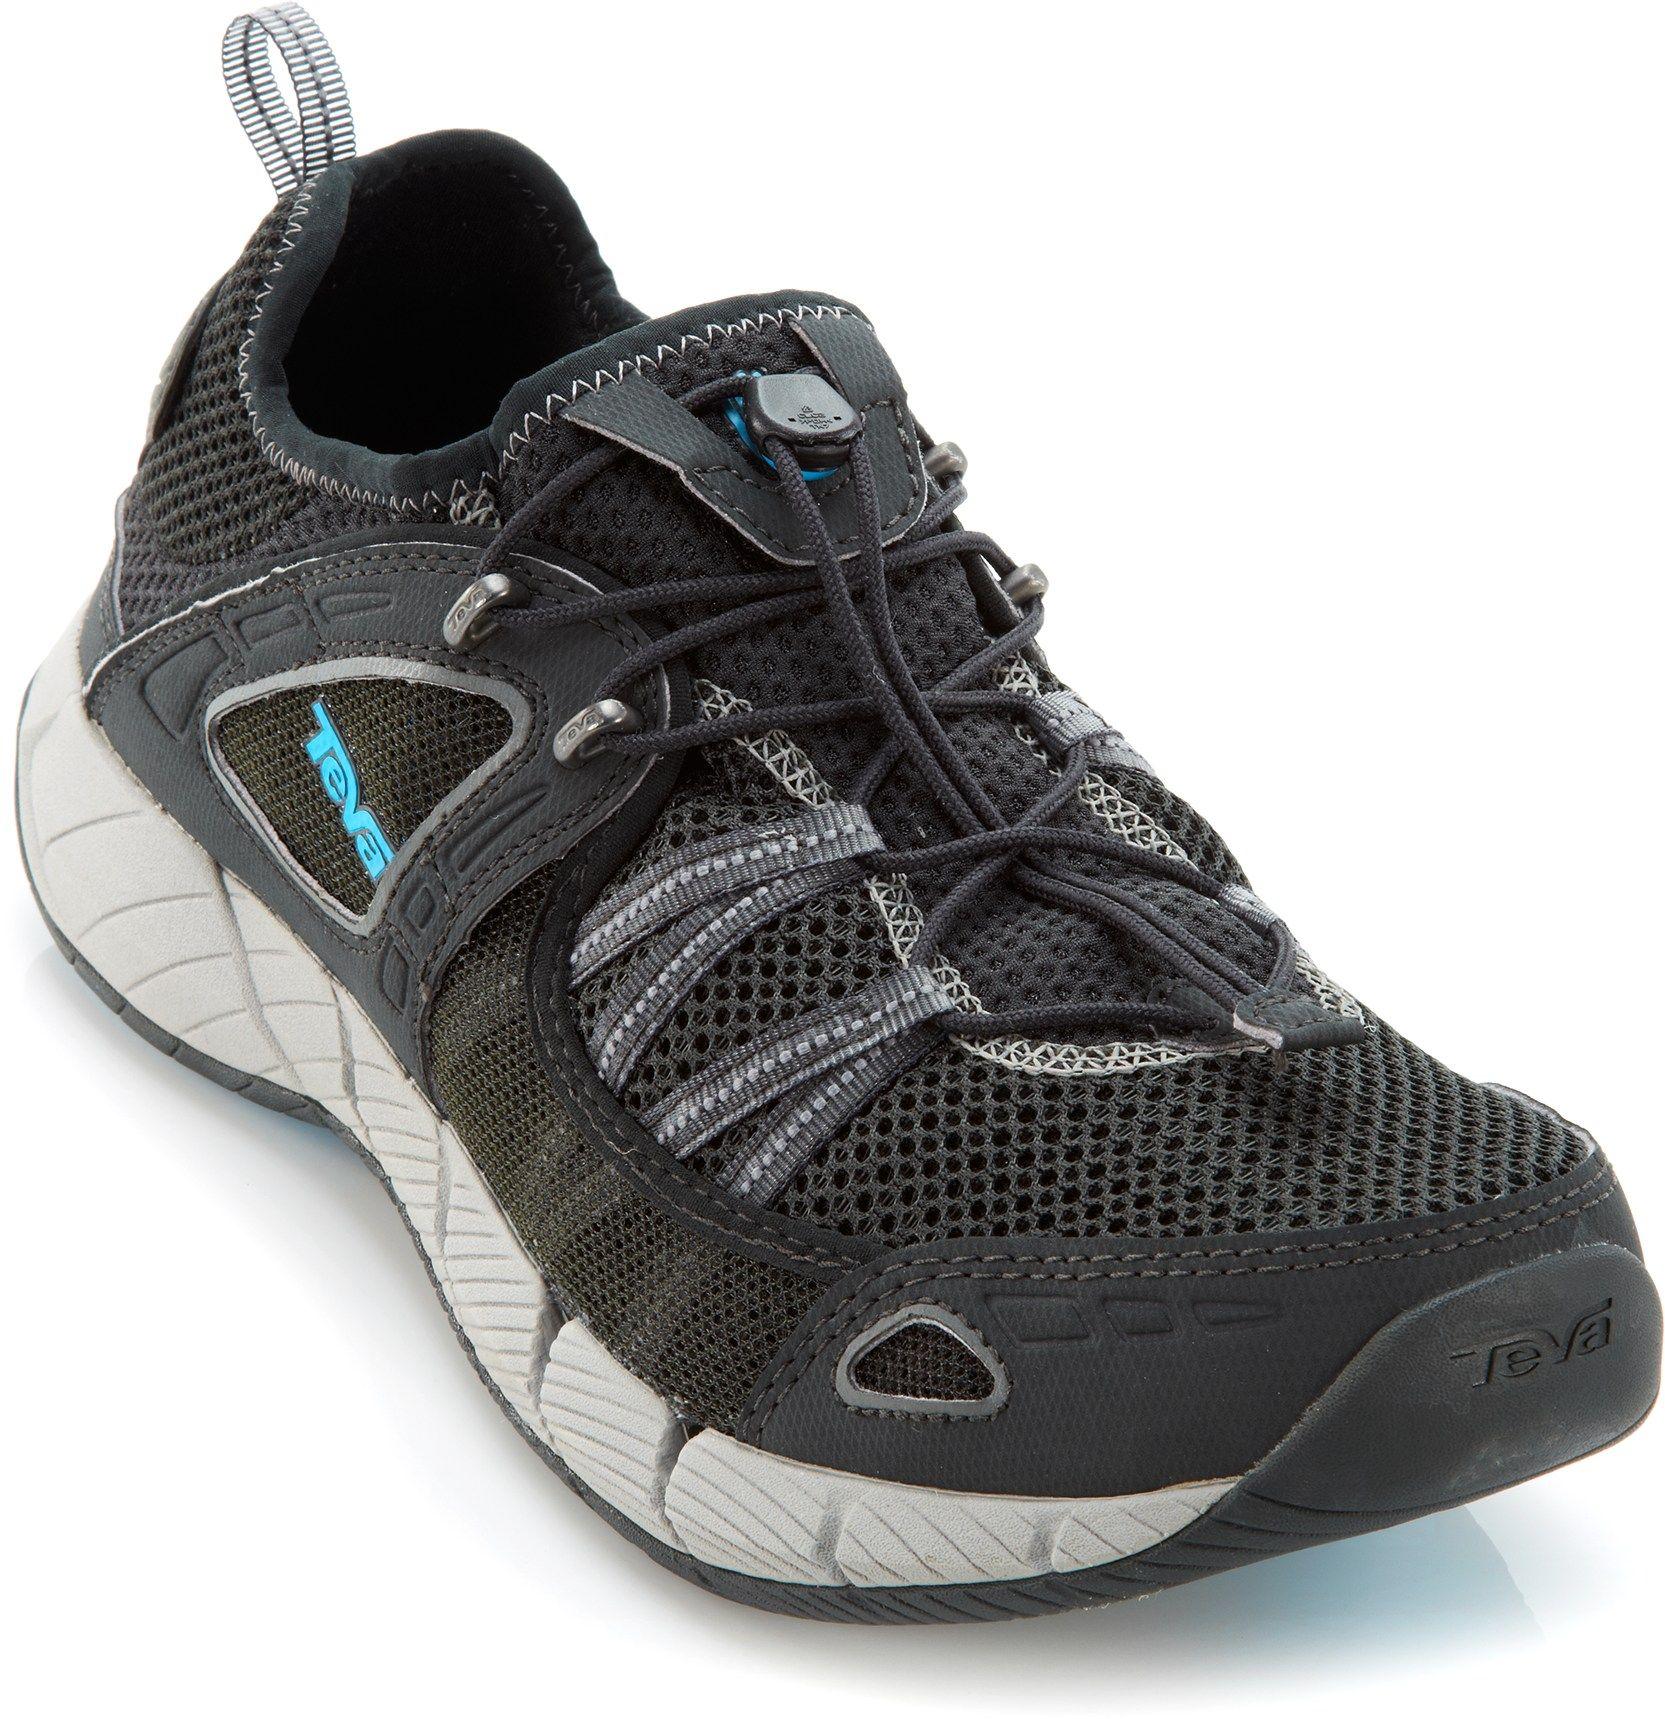 a39e5f890ad940 Teva Churn Water Shoes Kayak Paddle